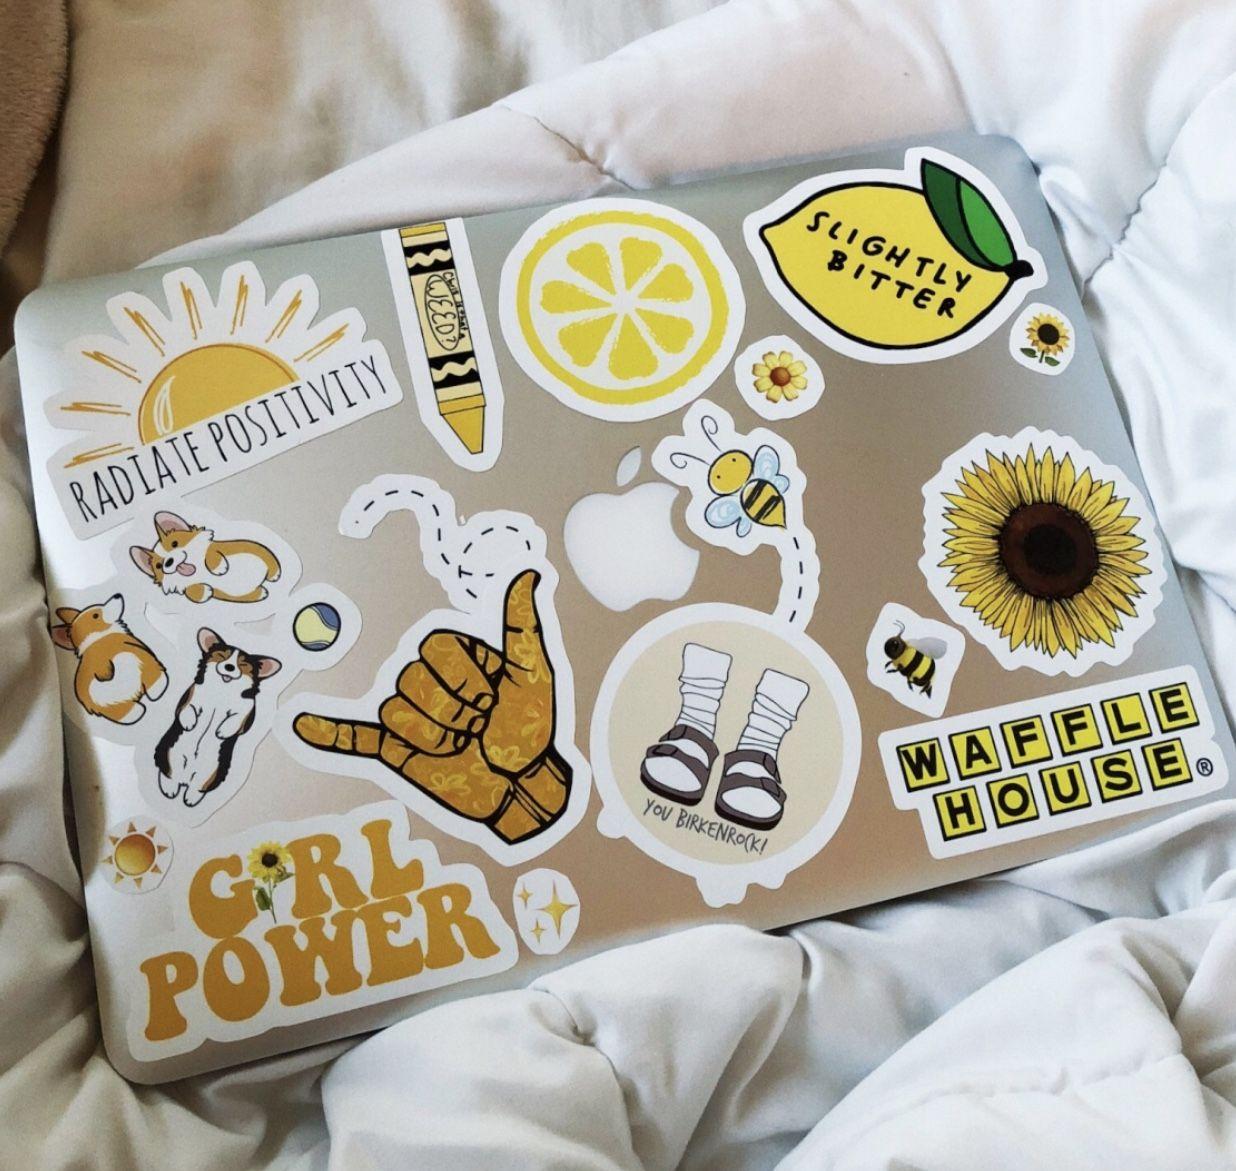 Pin by Tessdavis on Room decor in 2020 Cute laptop